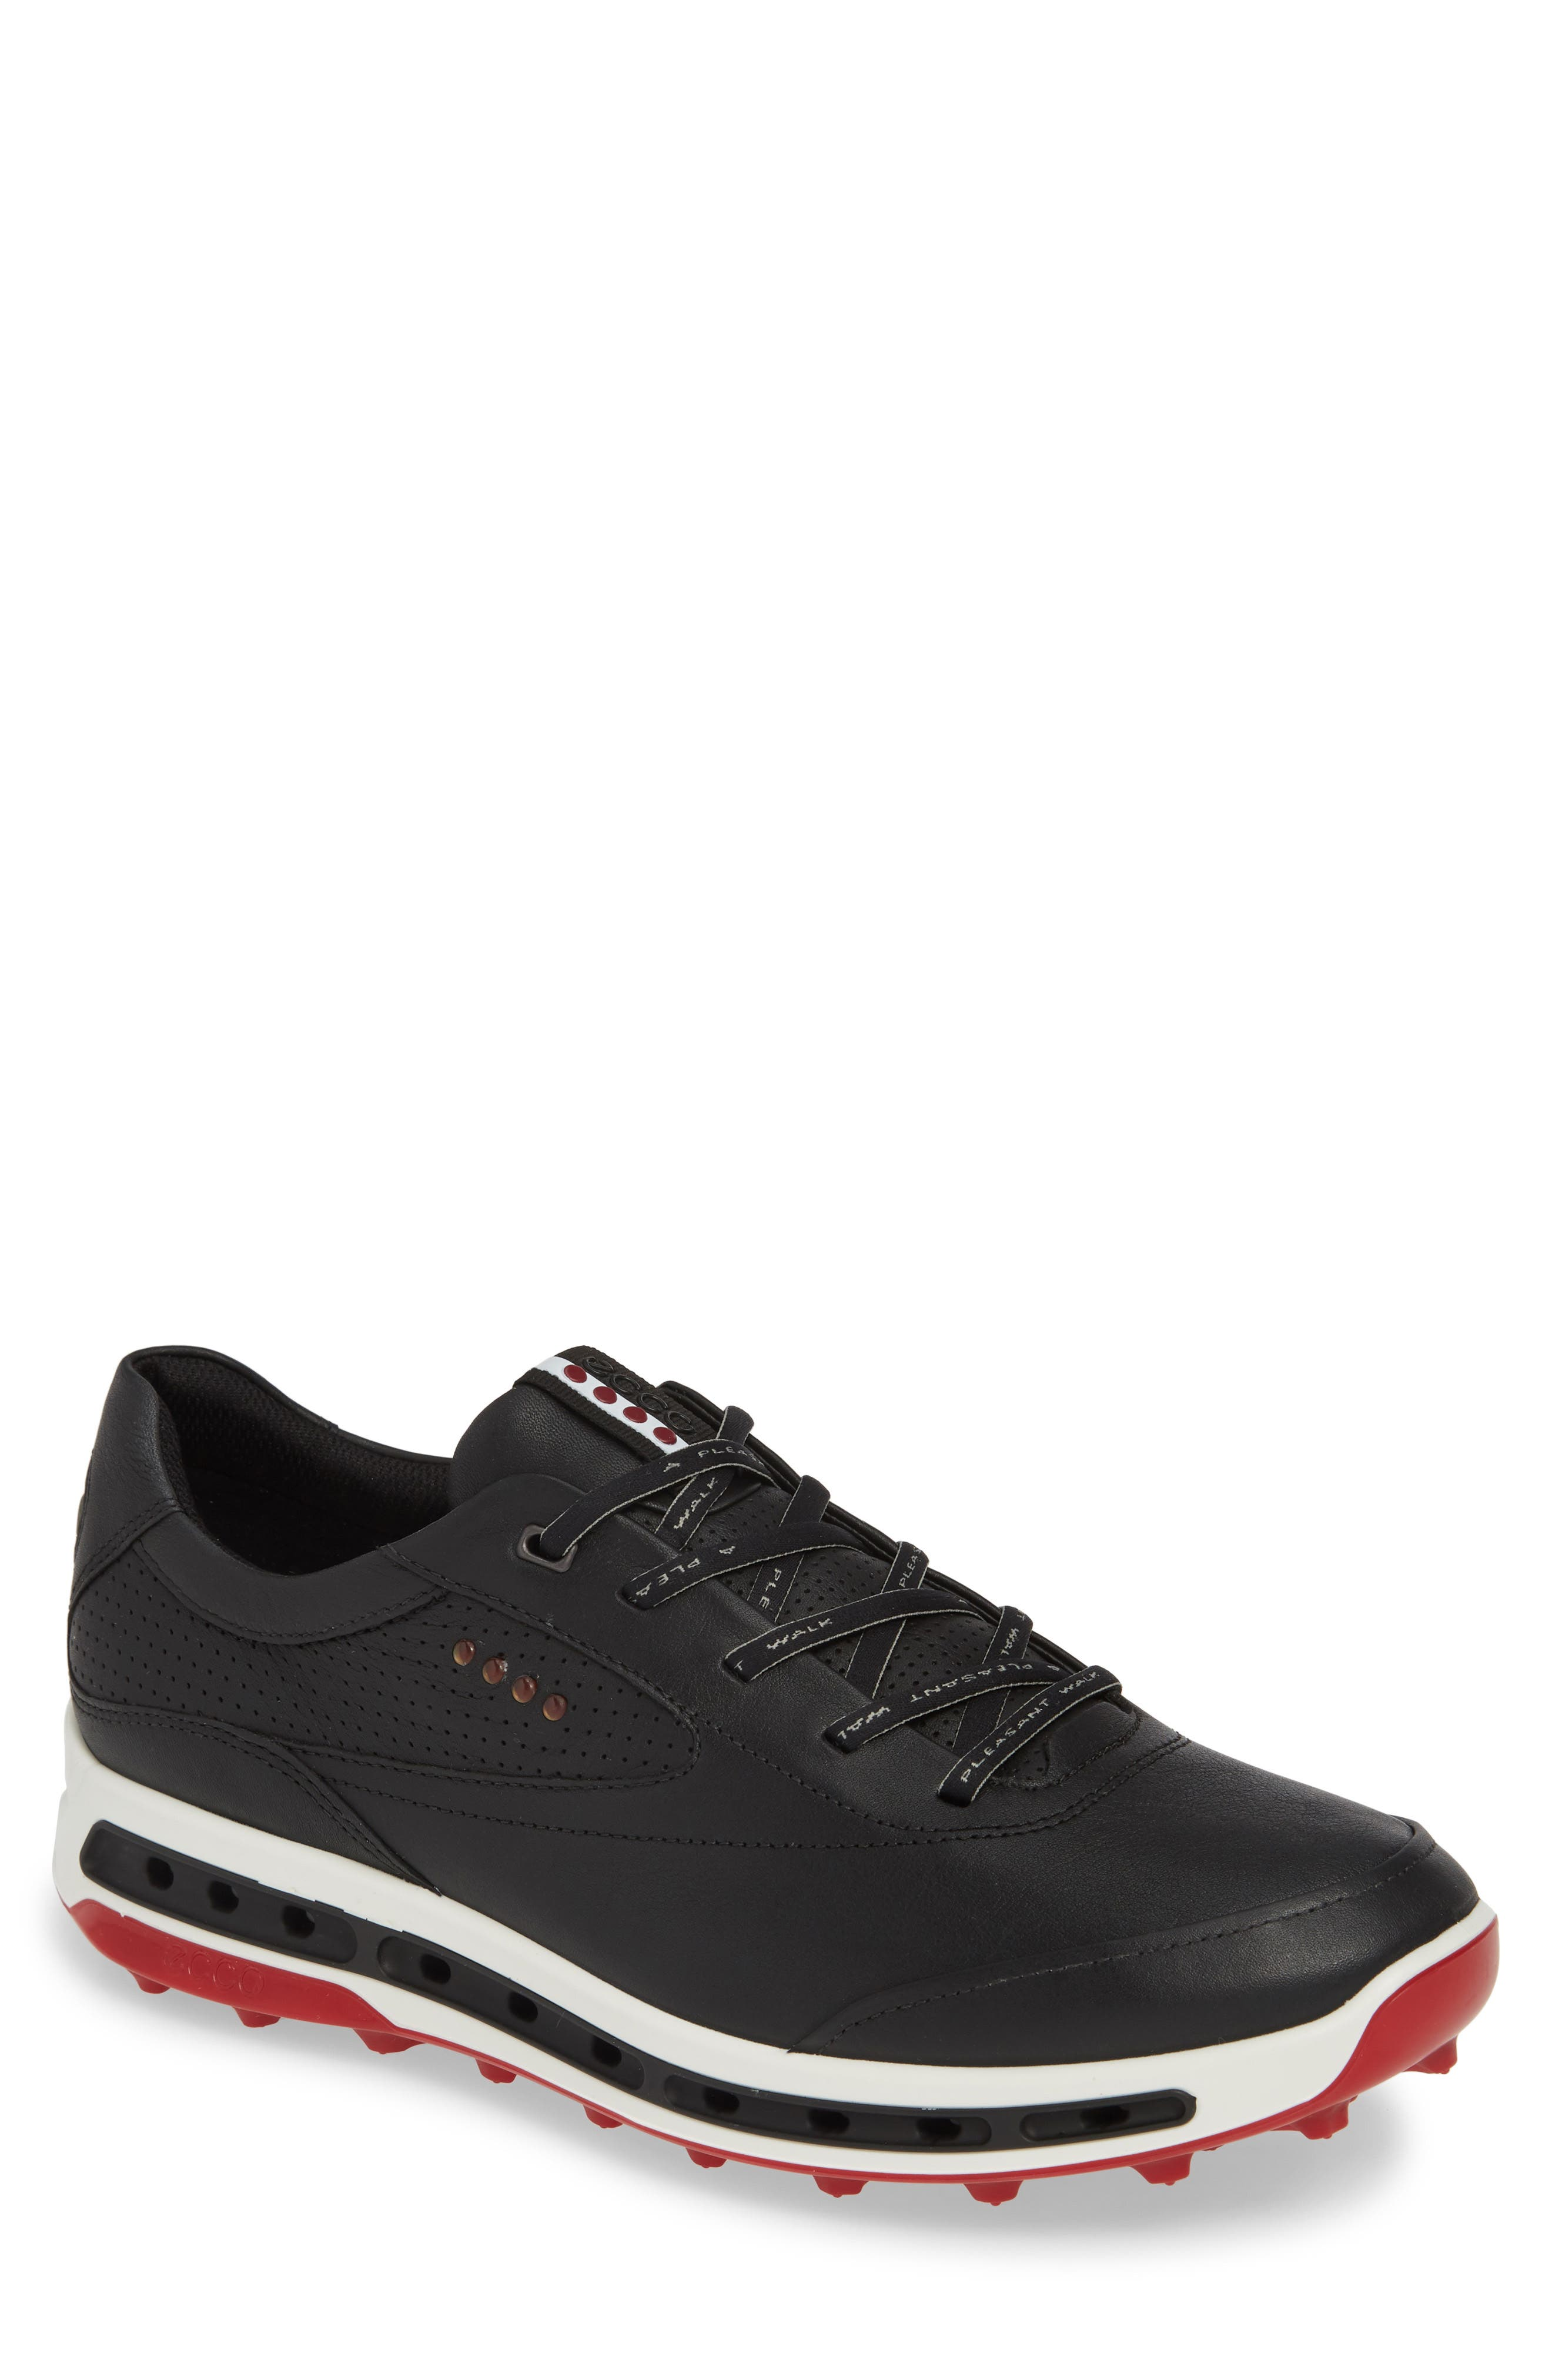 ECCO, Cool Pro Gore-Tex<sup>®</sup> Golf Shoe, Main thumbnail 1, color, BLACK/ BRICK LEATHER